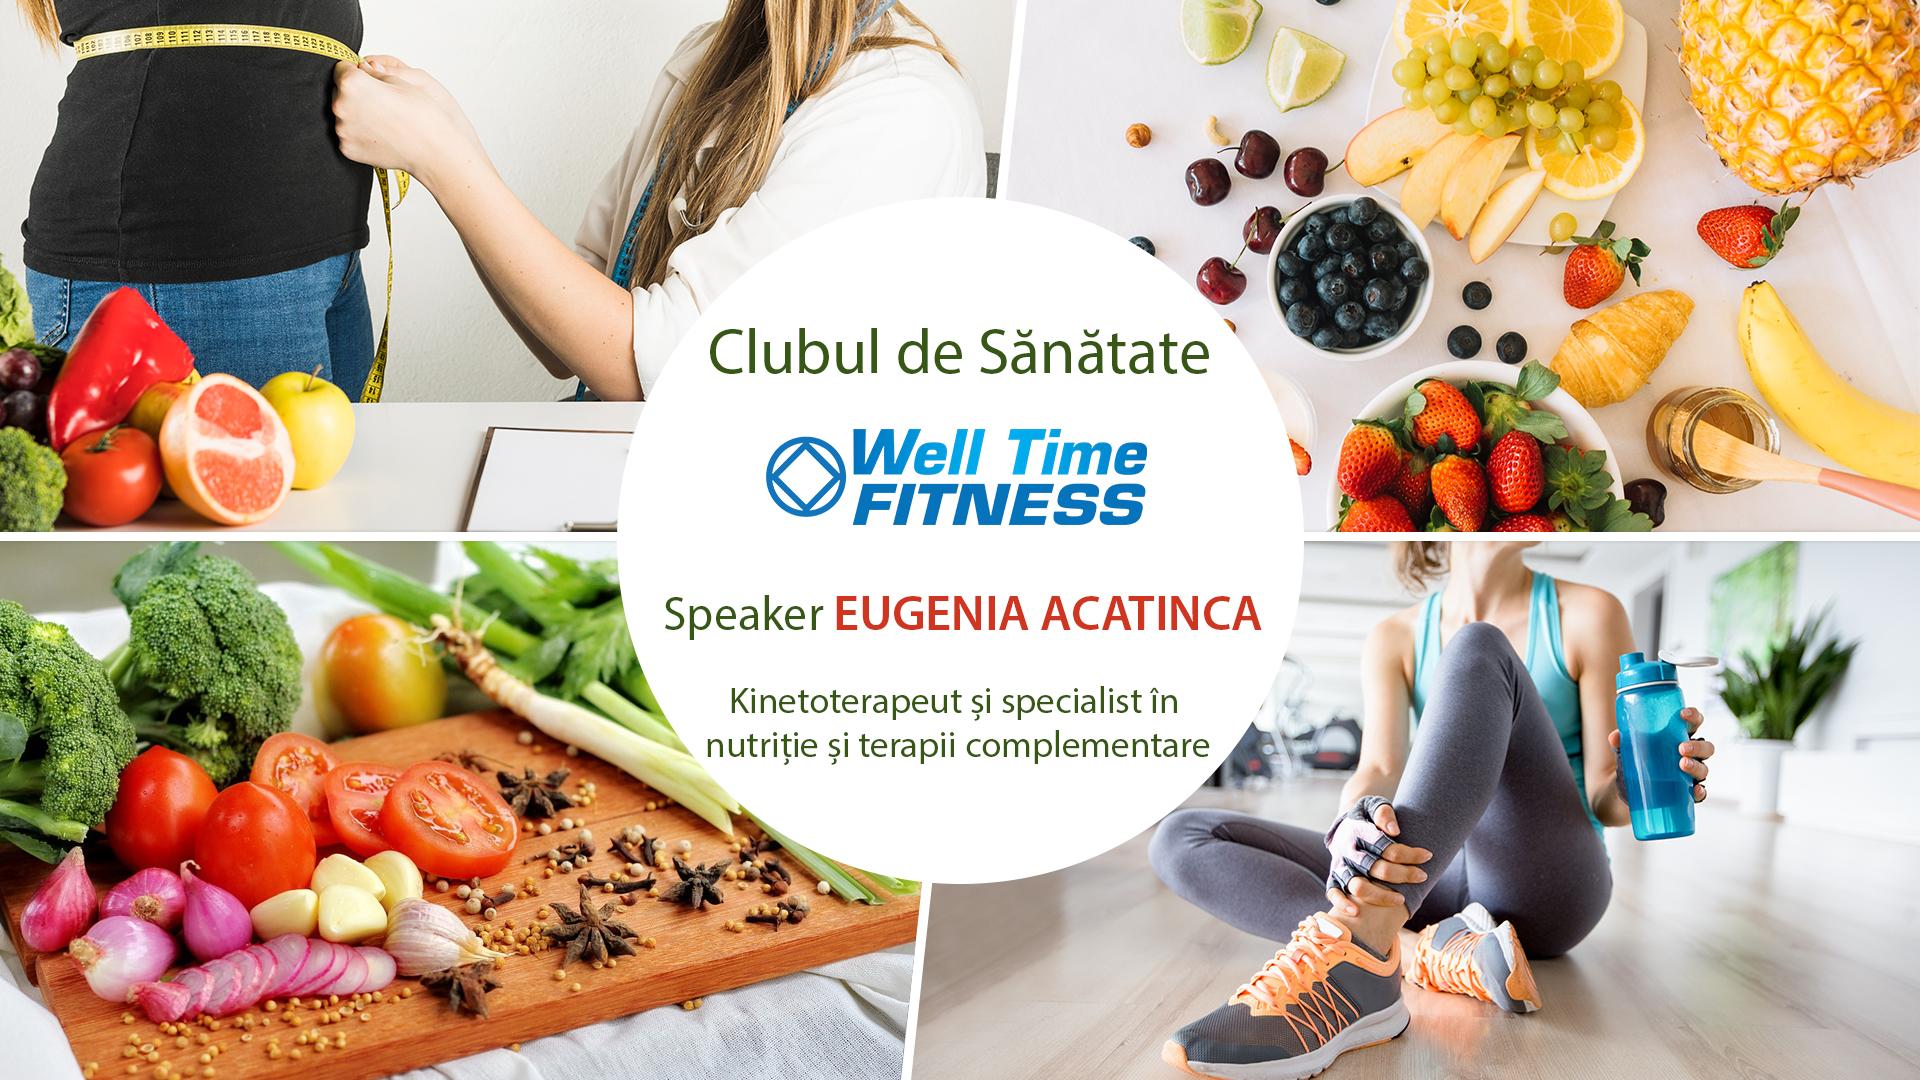 Clubul de sanatate Well Time Fitness